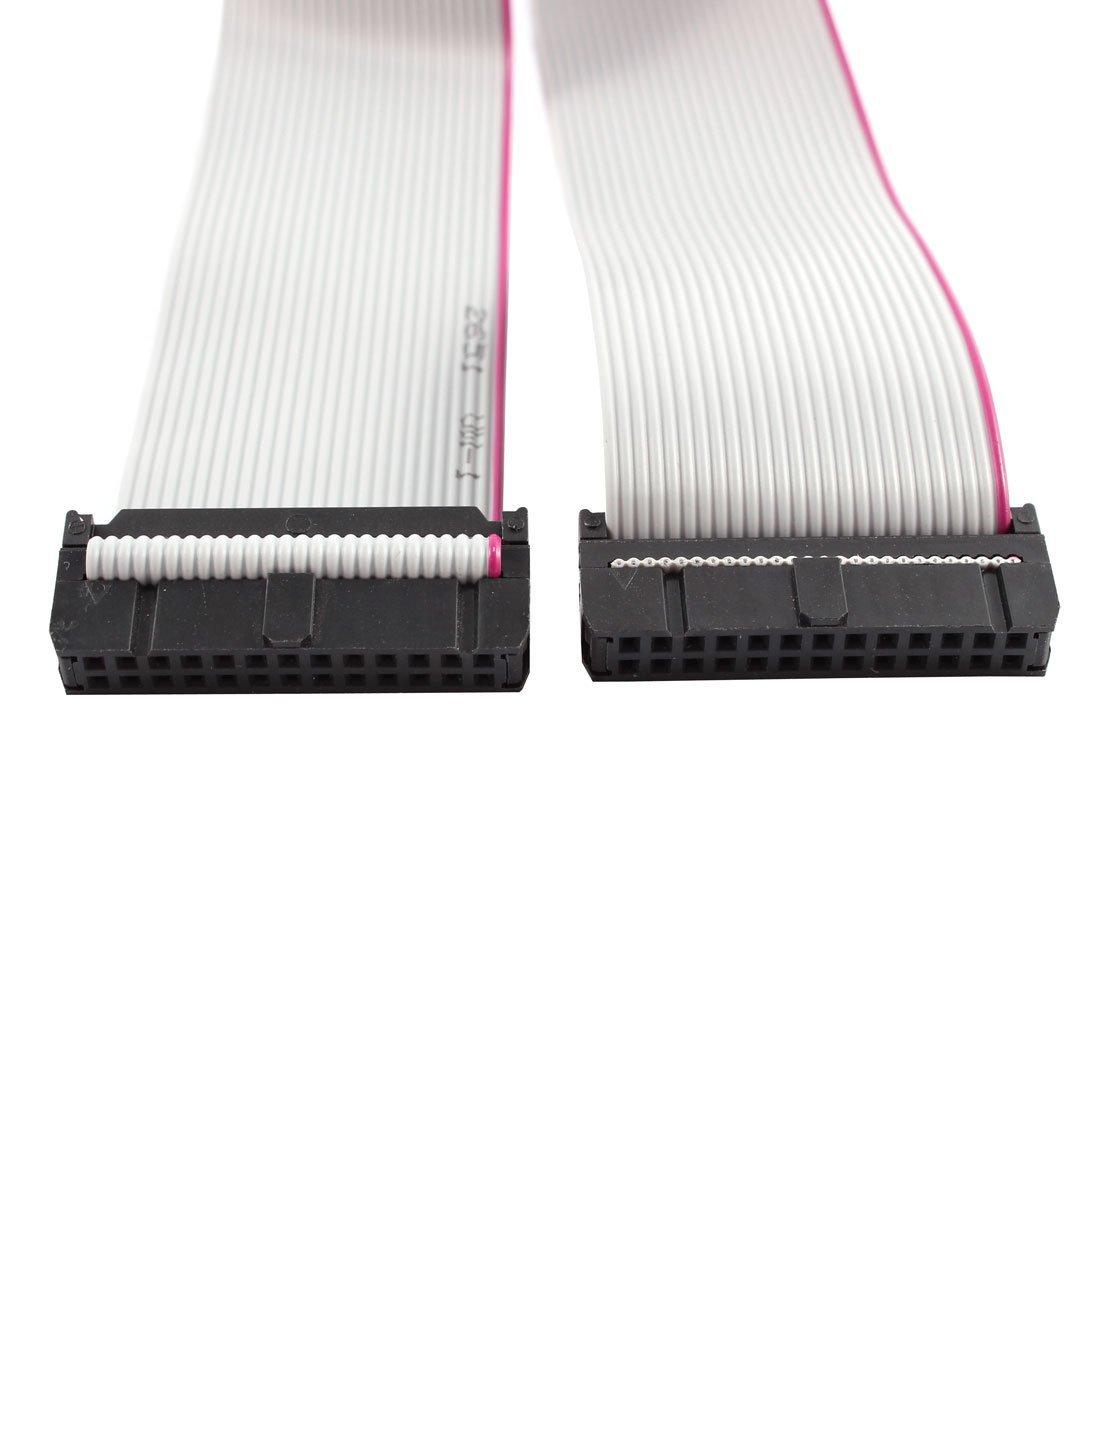 Amazon.com: eDealMax 5 Piezas ZP5210 acuario de agua de nivel de líquido del Sensor interruptor de flotador flotante: Electronics